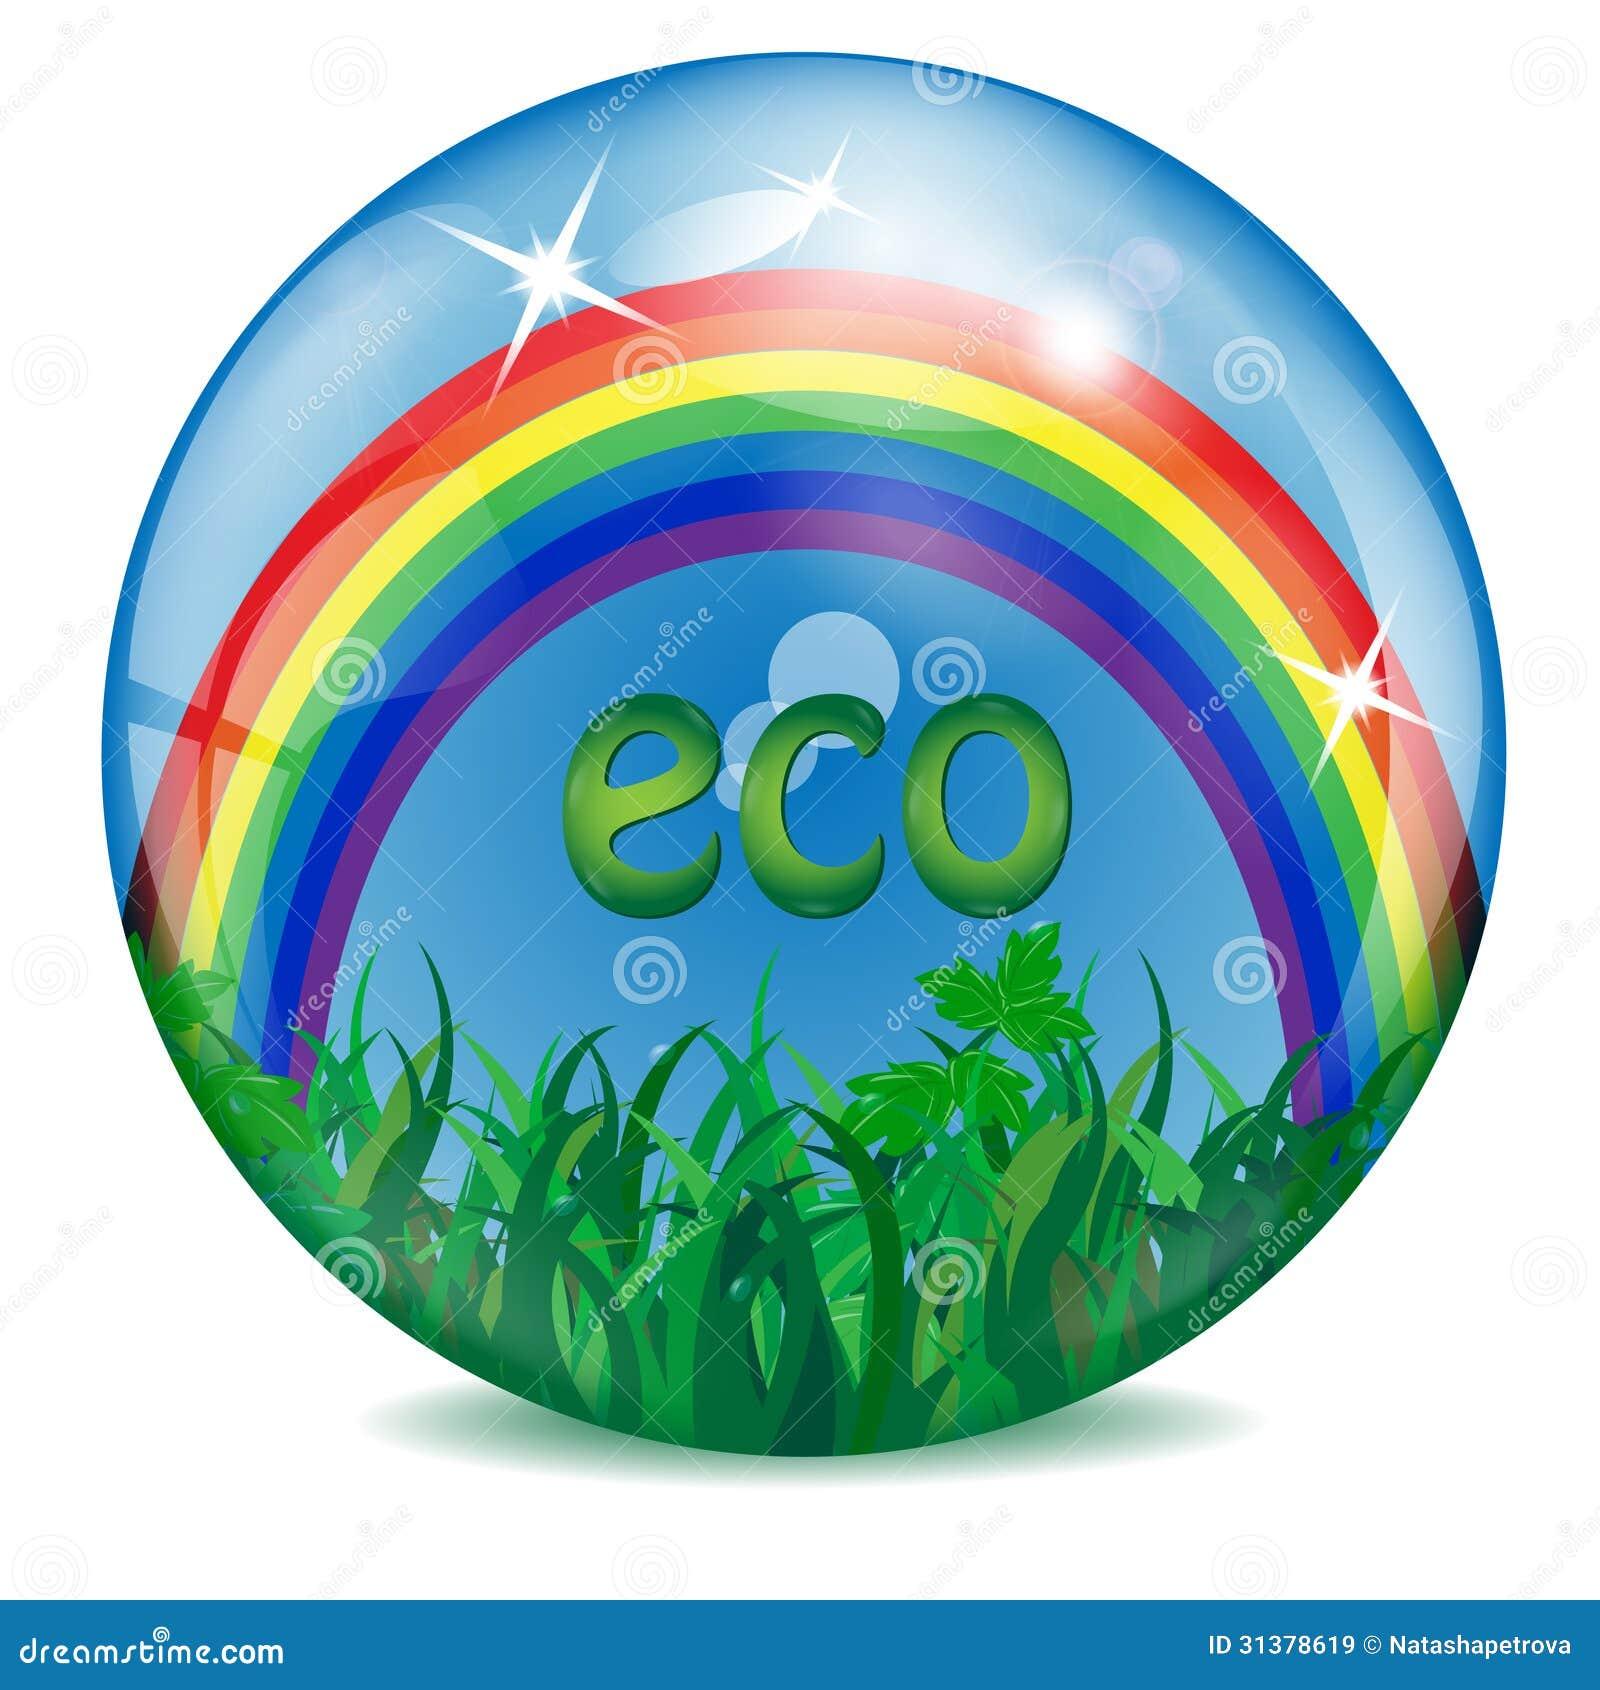 rainbow dash sphere background - photo #42